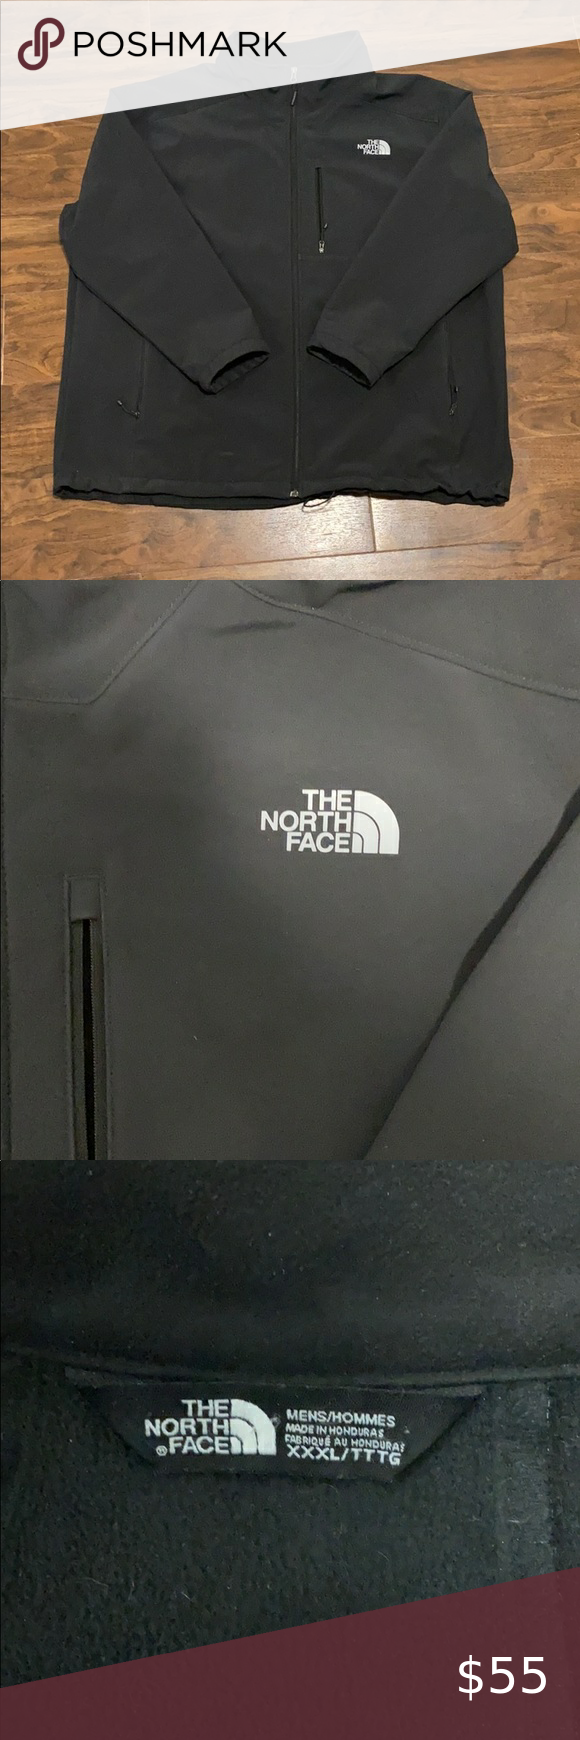 The North Face Men S Zip Up Black Jacket Size 3x North Face Mens Black Jacket The North Face [ 1740 x 580 Pixel ]